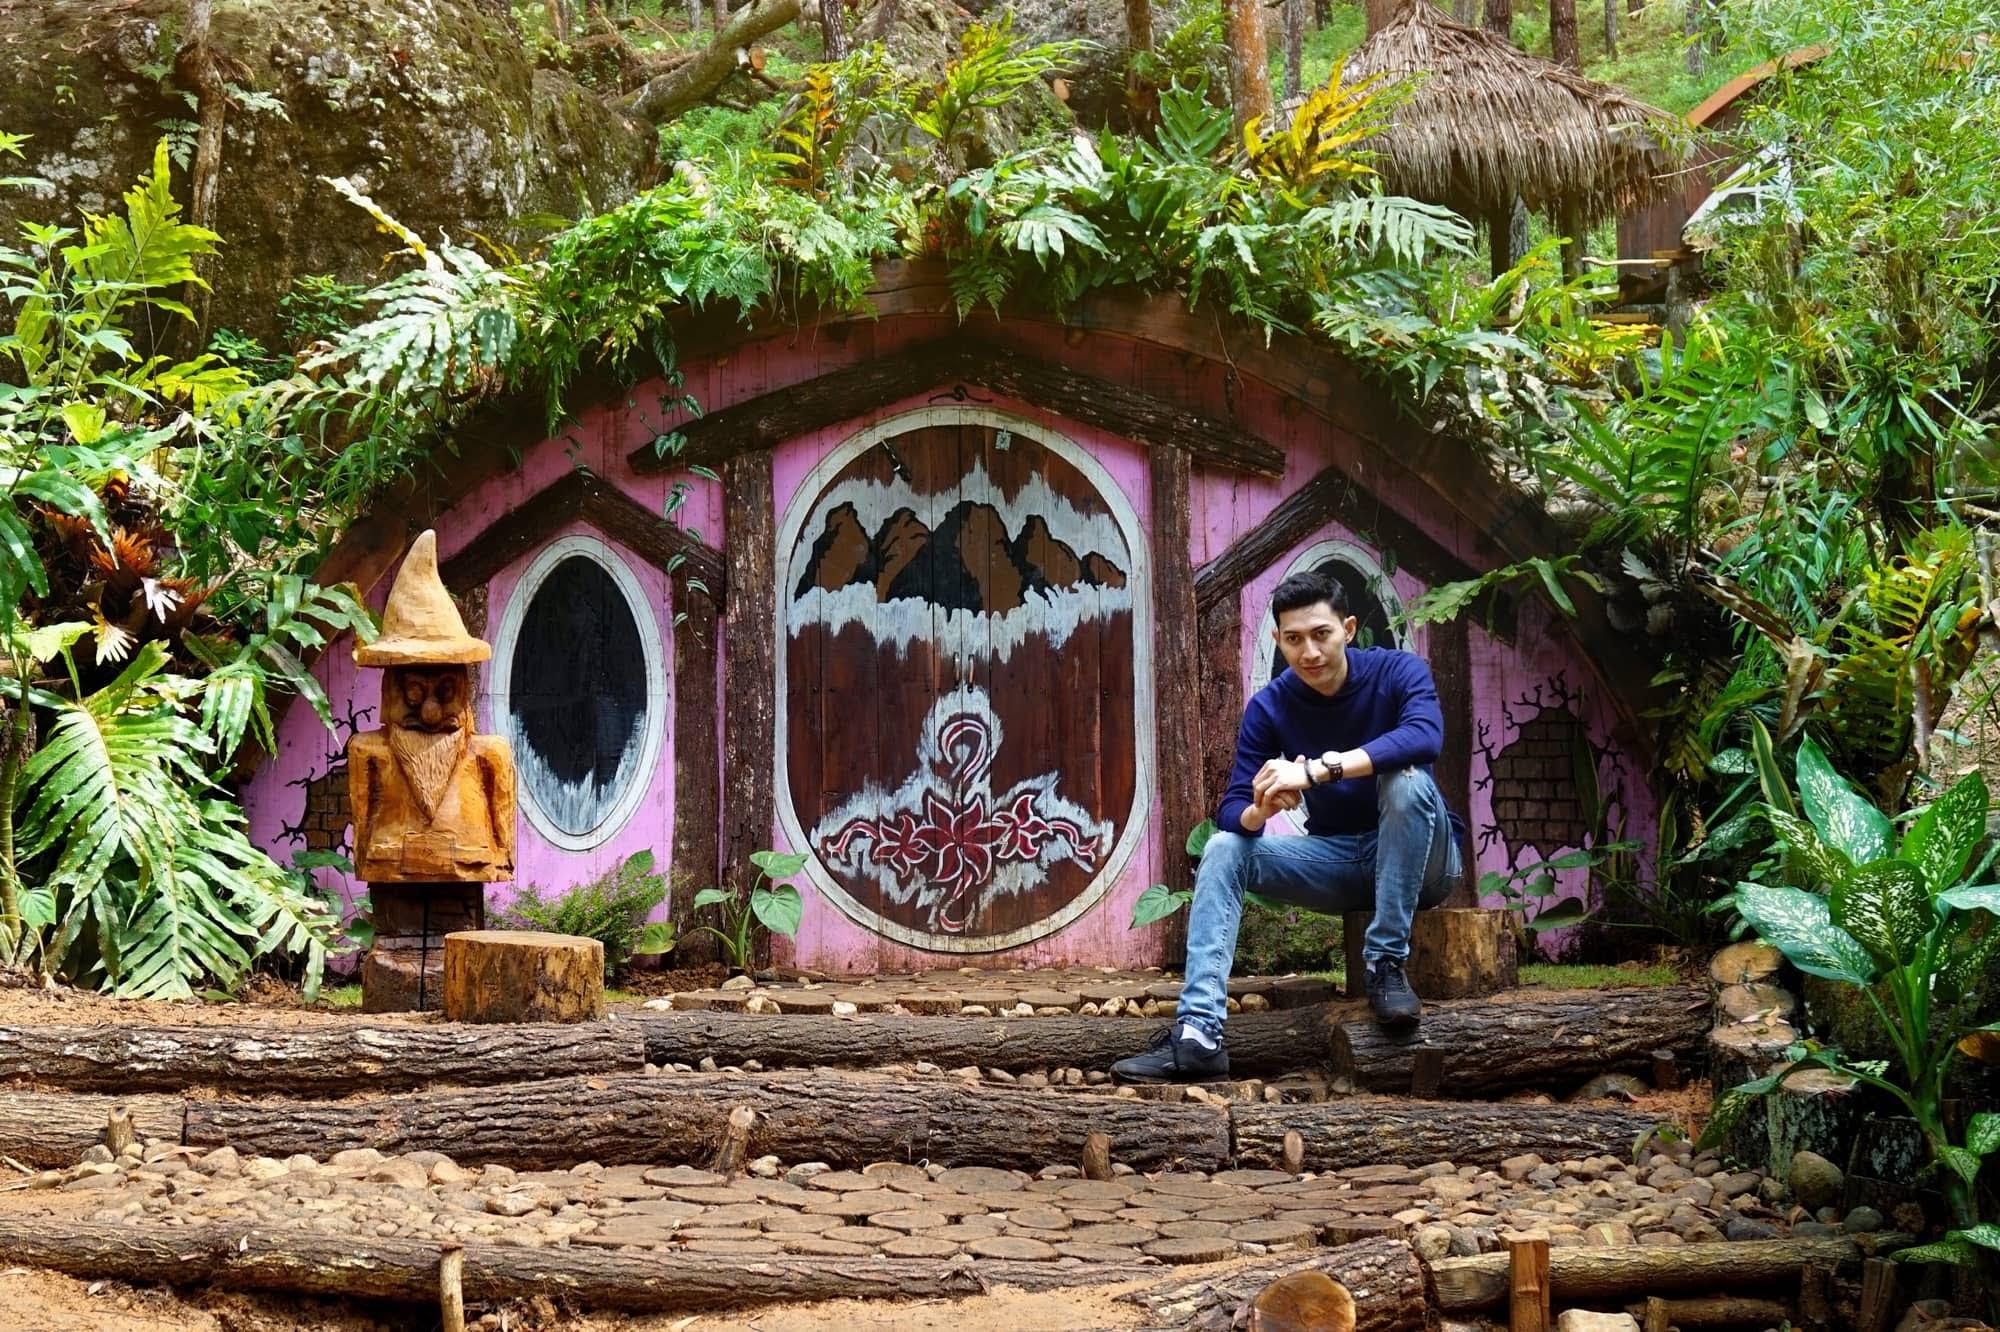 Rumah Hobbit Seribu Batu Songgo Langit, Yogyakarta